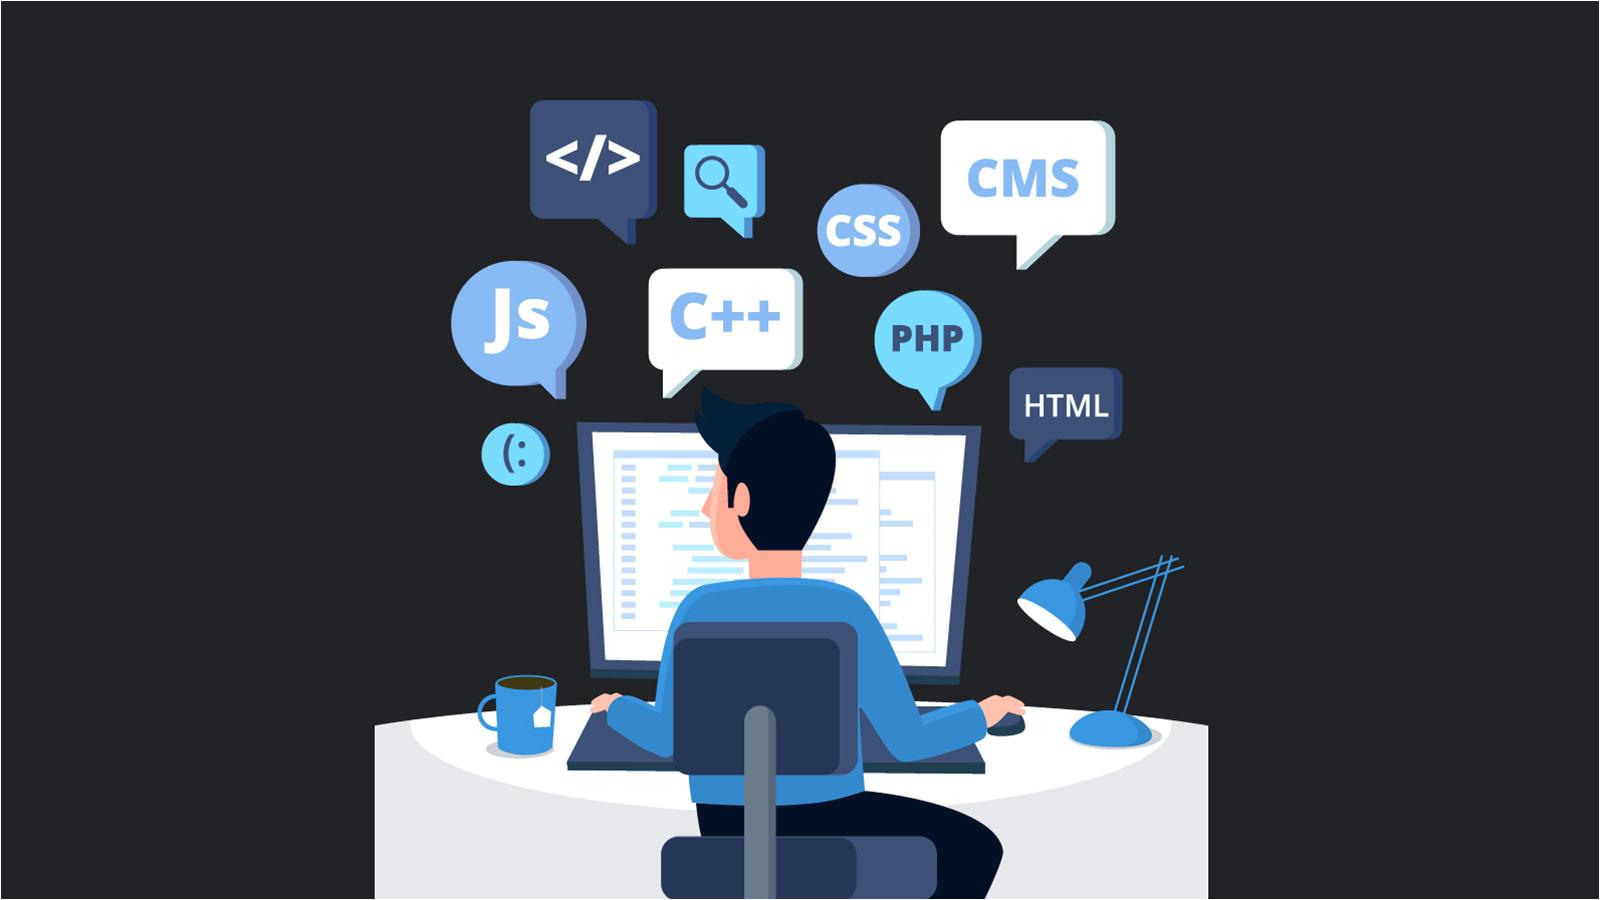 software engineer job description